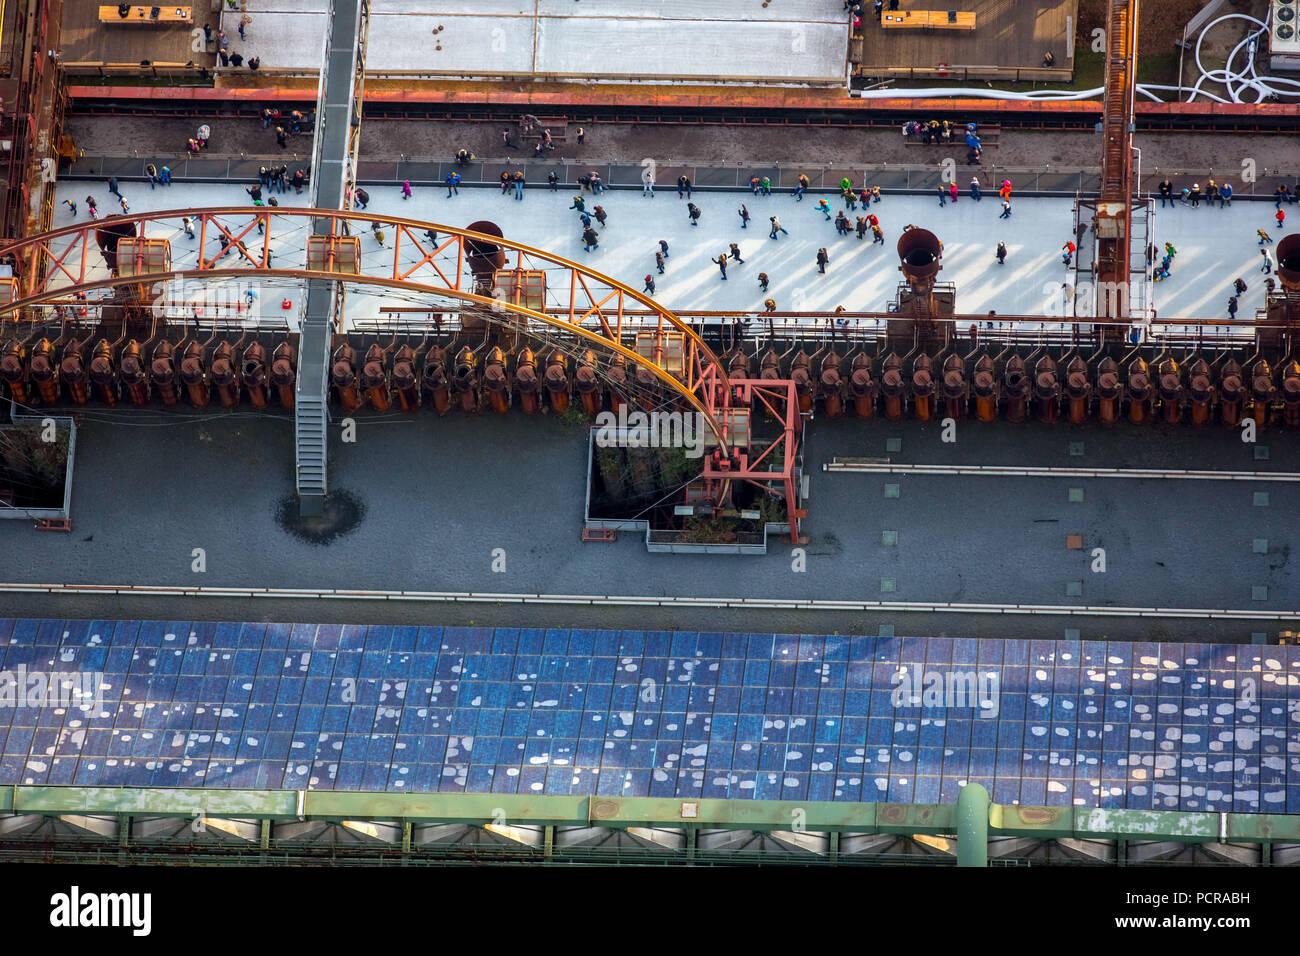 Ice rink coking plant Zeche Zollverein with sun wheel on Zollverein, skaters, industrial scenery, industrial romance, world cultural heritage Zeche Zollverein Essen, Ruhr area, North Rhine-Westphalia, Germany - Stock Image